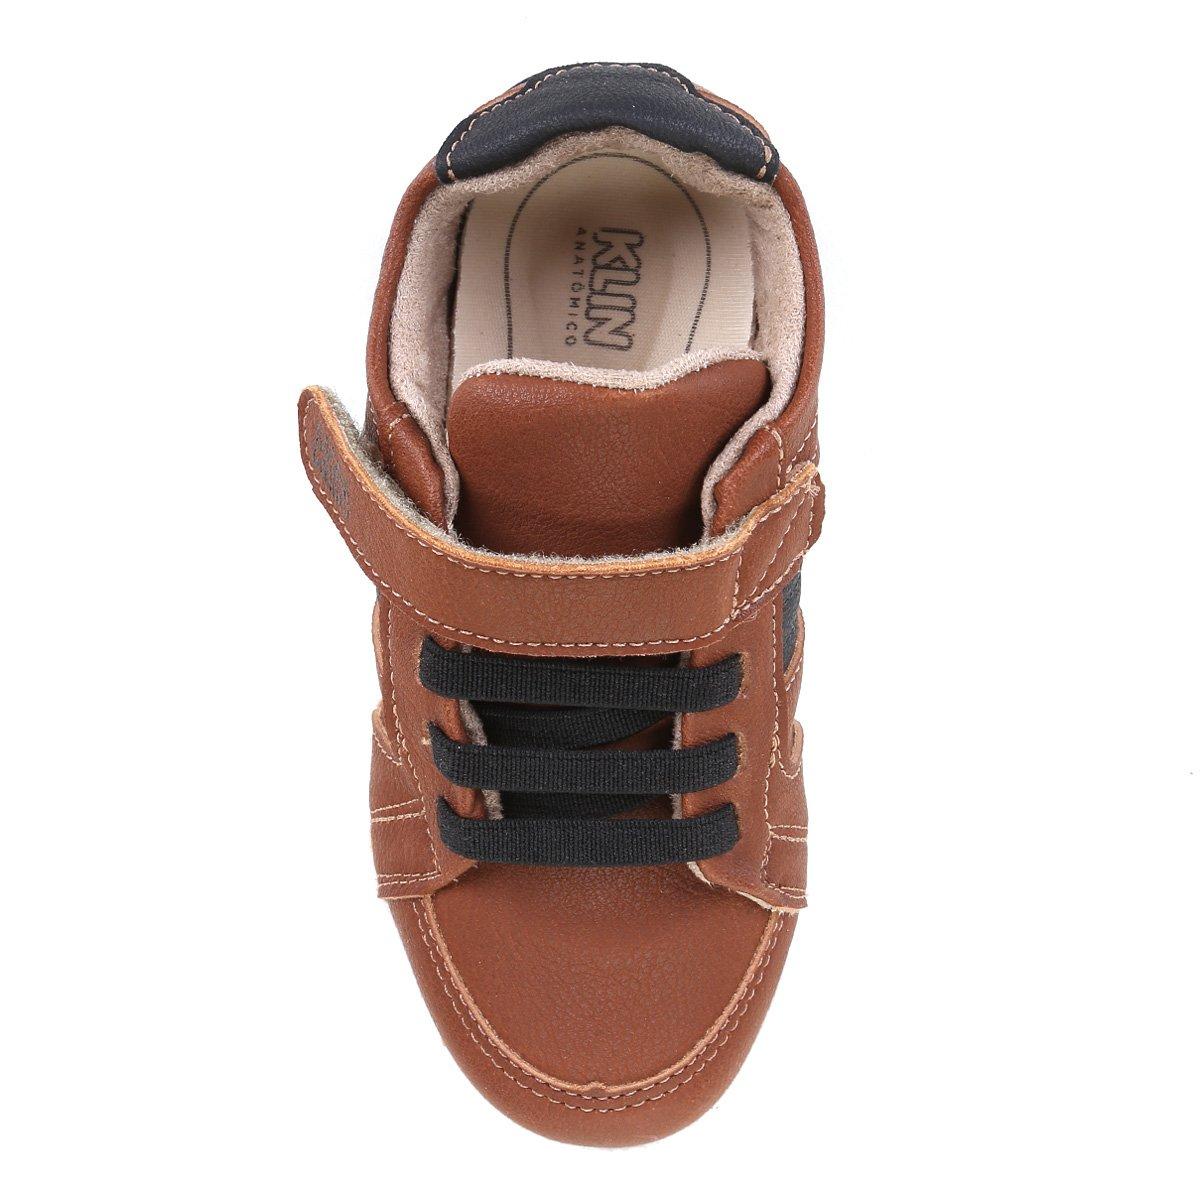 1498c41a3d Tênis Infantil Klin Velcro Baby Flyer Menino - Tam: 26 - Shopping ...